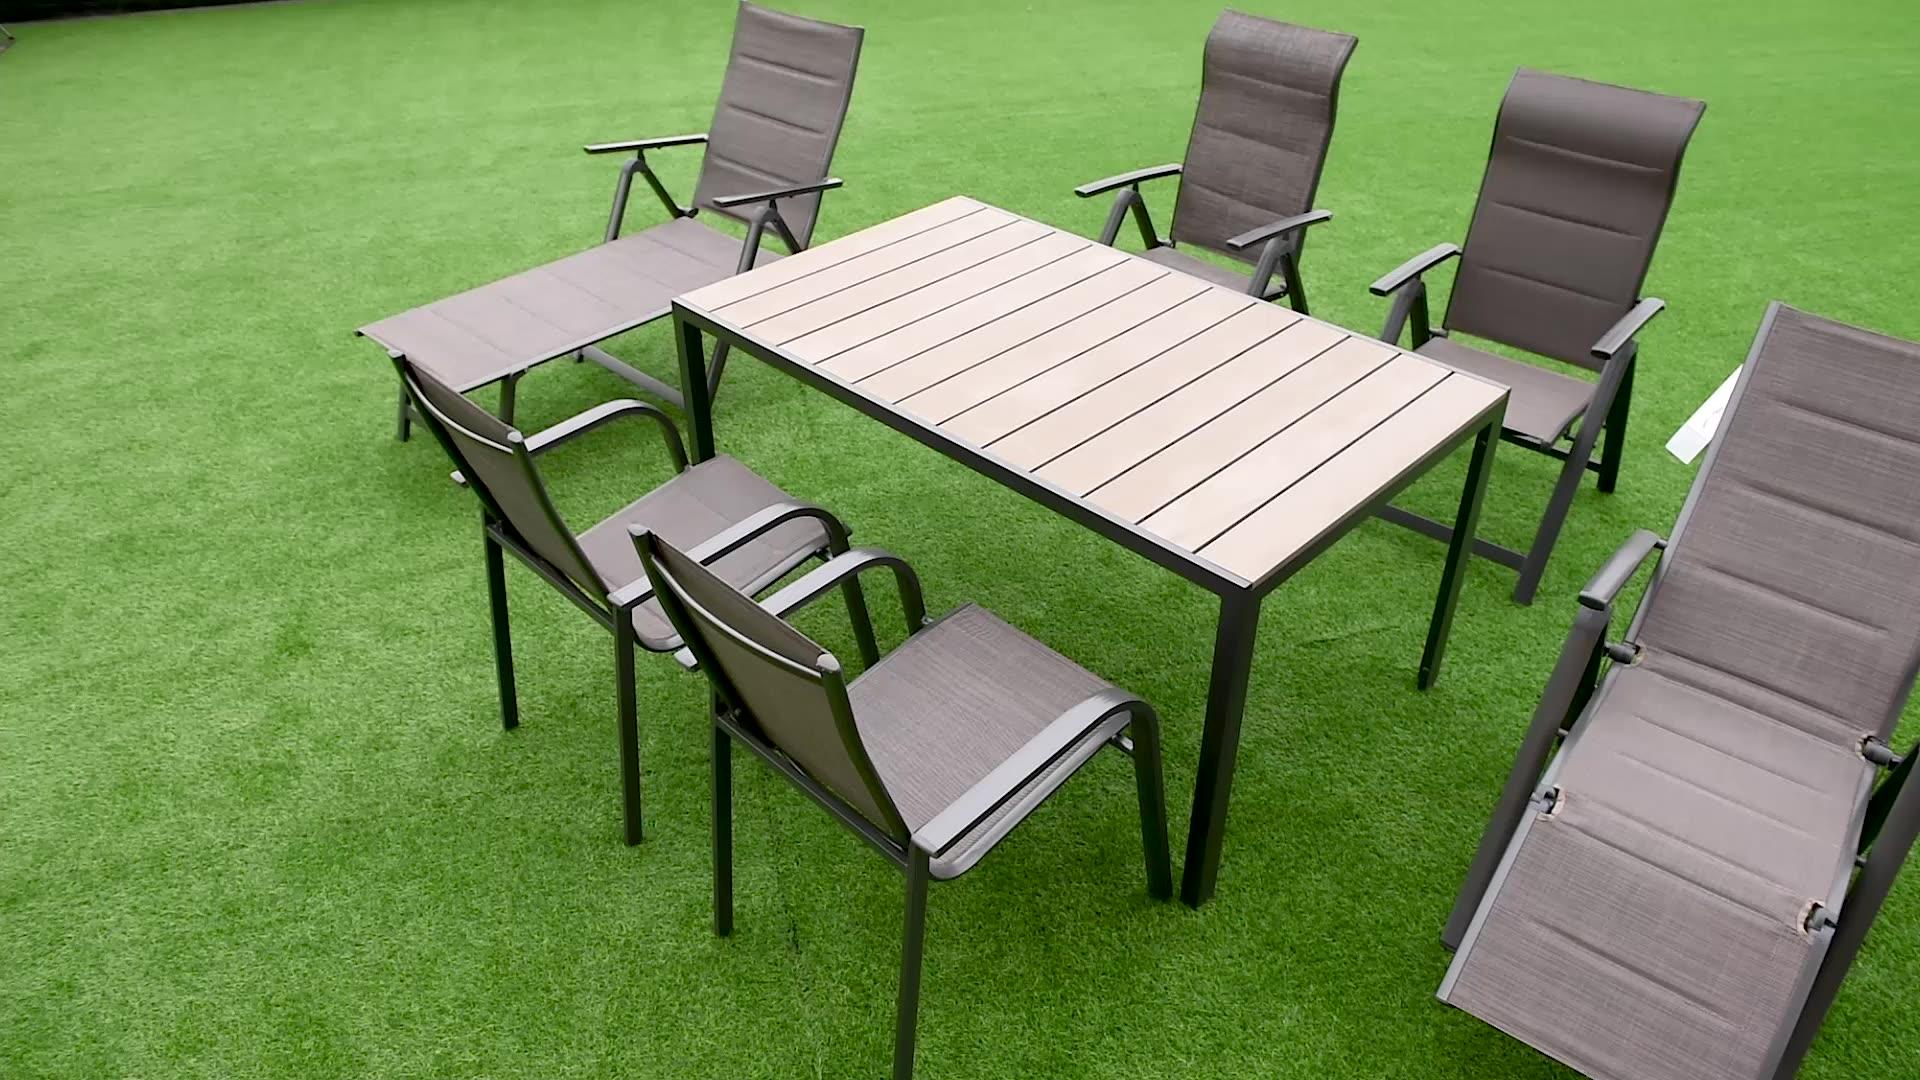 आउटडोर बालकनी एल्यूमीनियम Teslin उद्यान तह कुर्सी